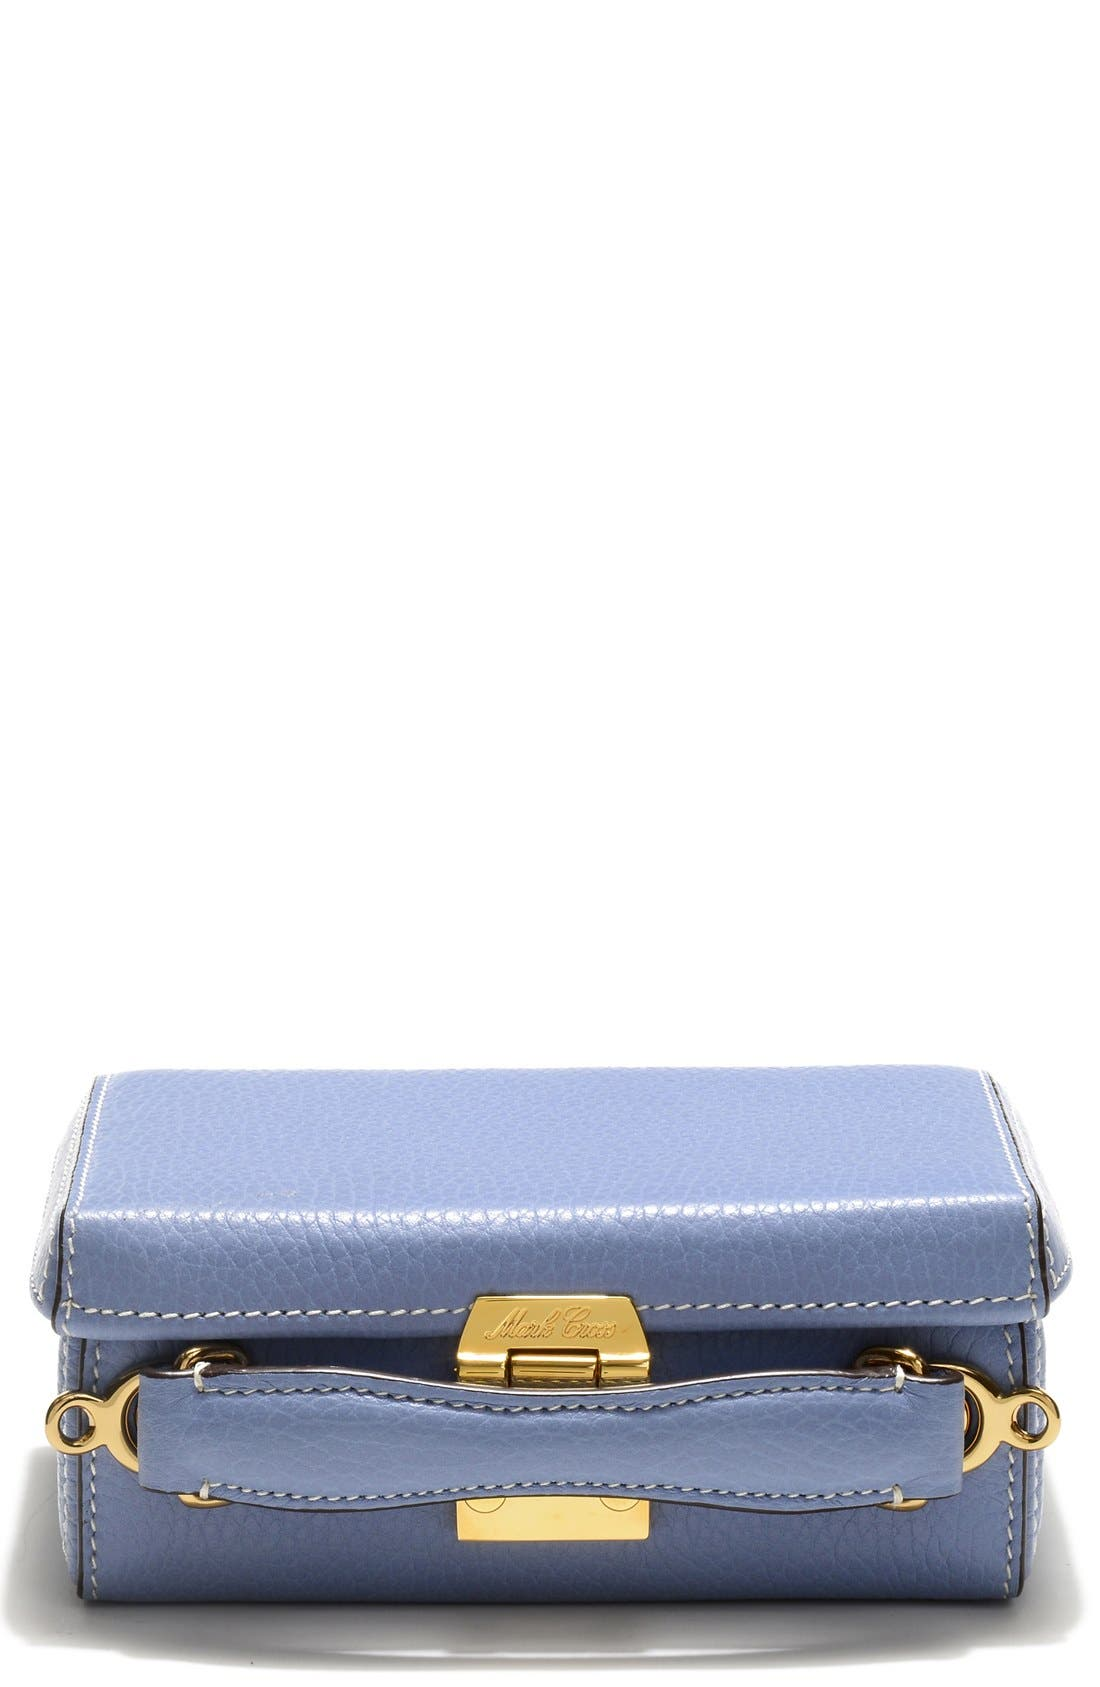 Alternate Image 1 Selected - Mark Cross 'Mini Grace' Pebbled Leather Box Bag